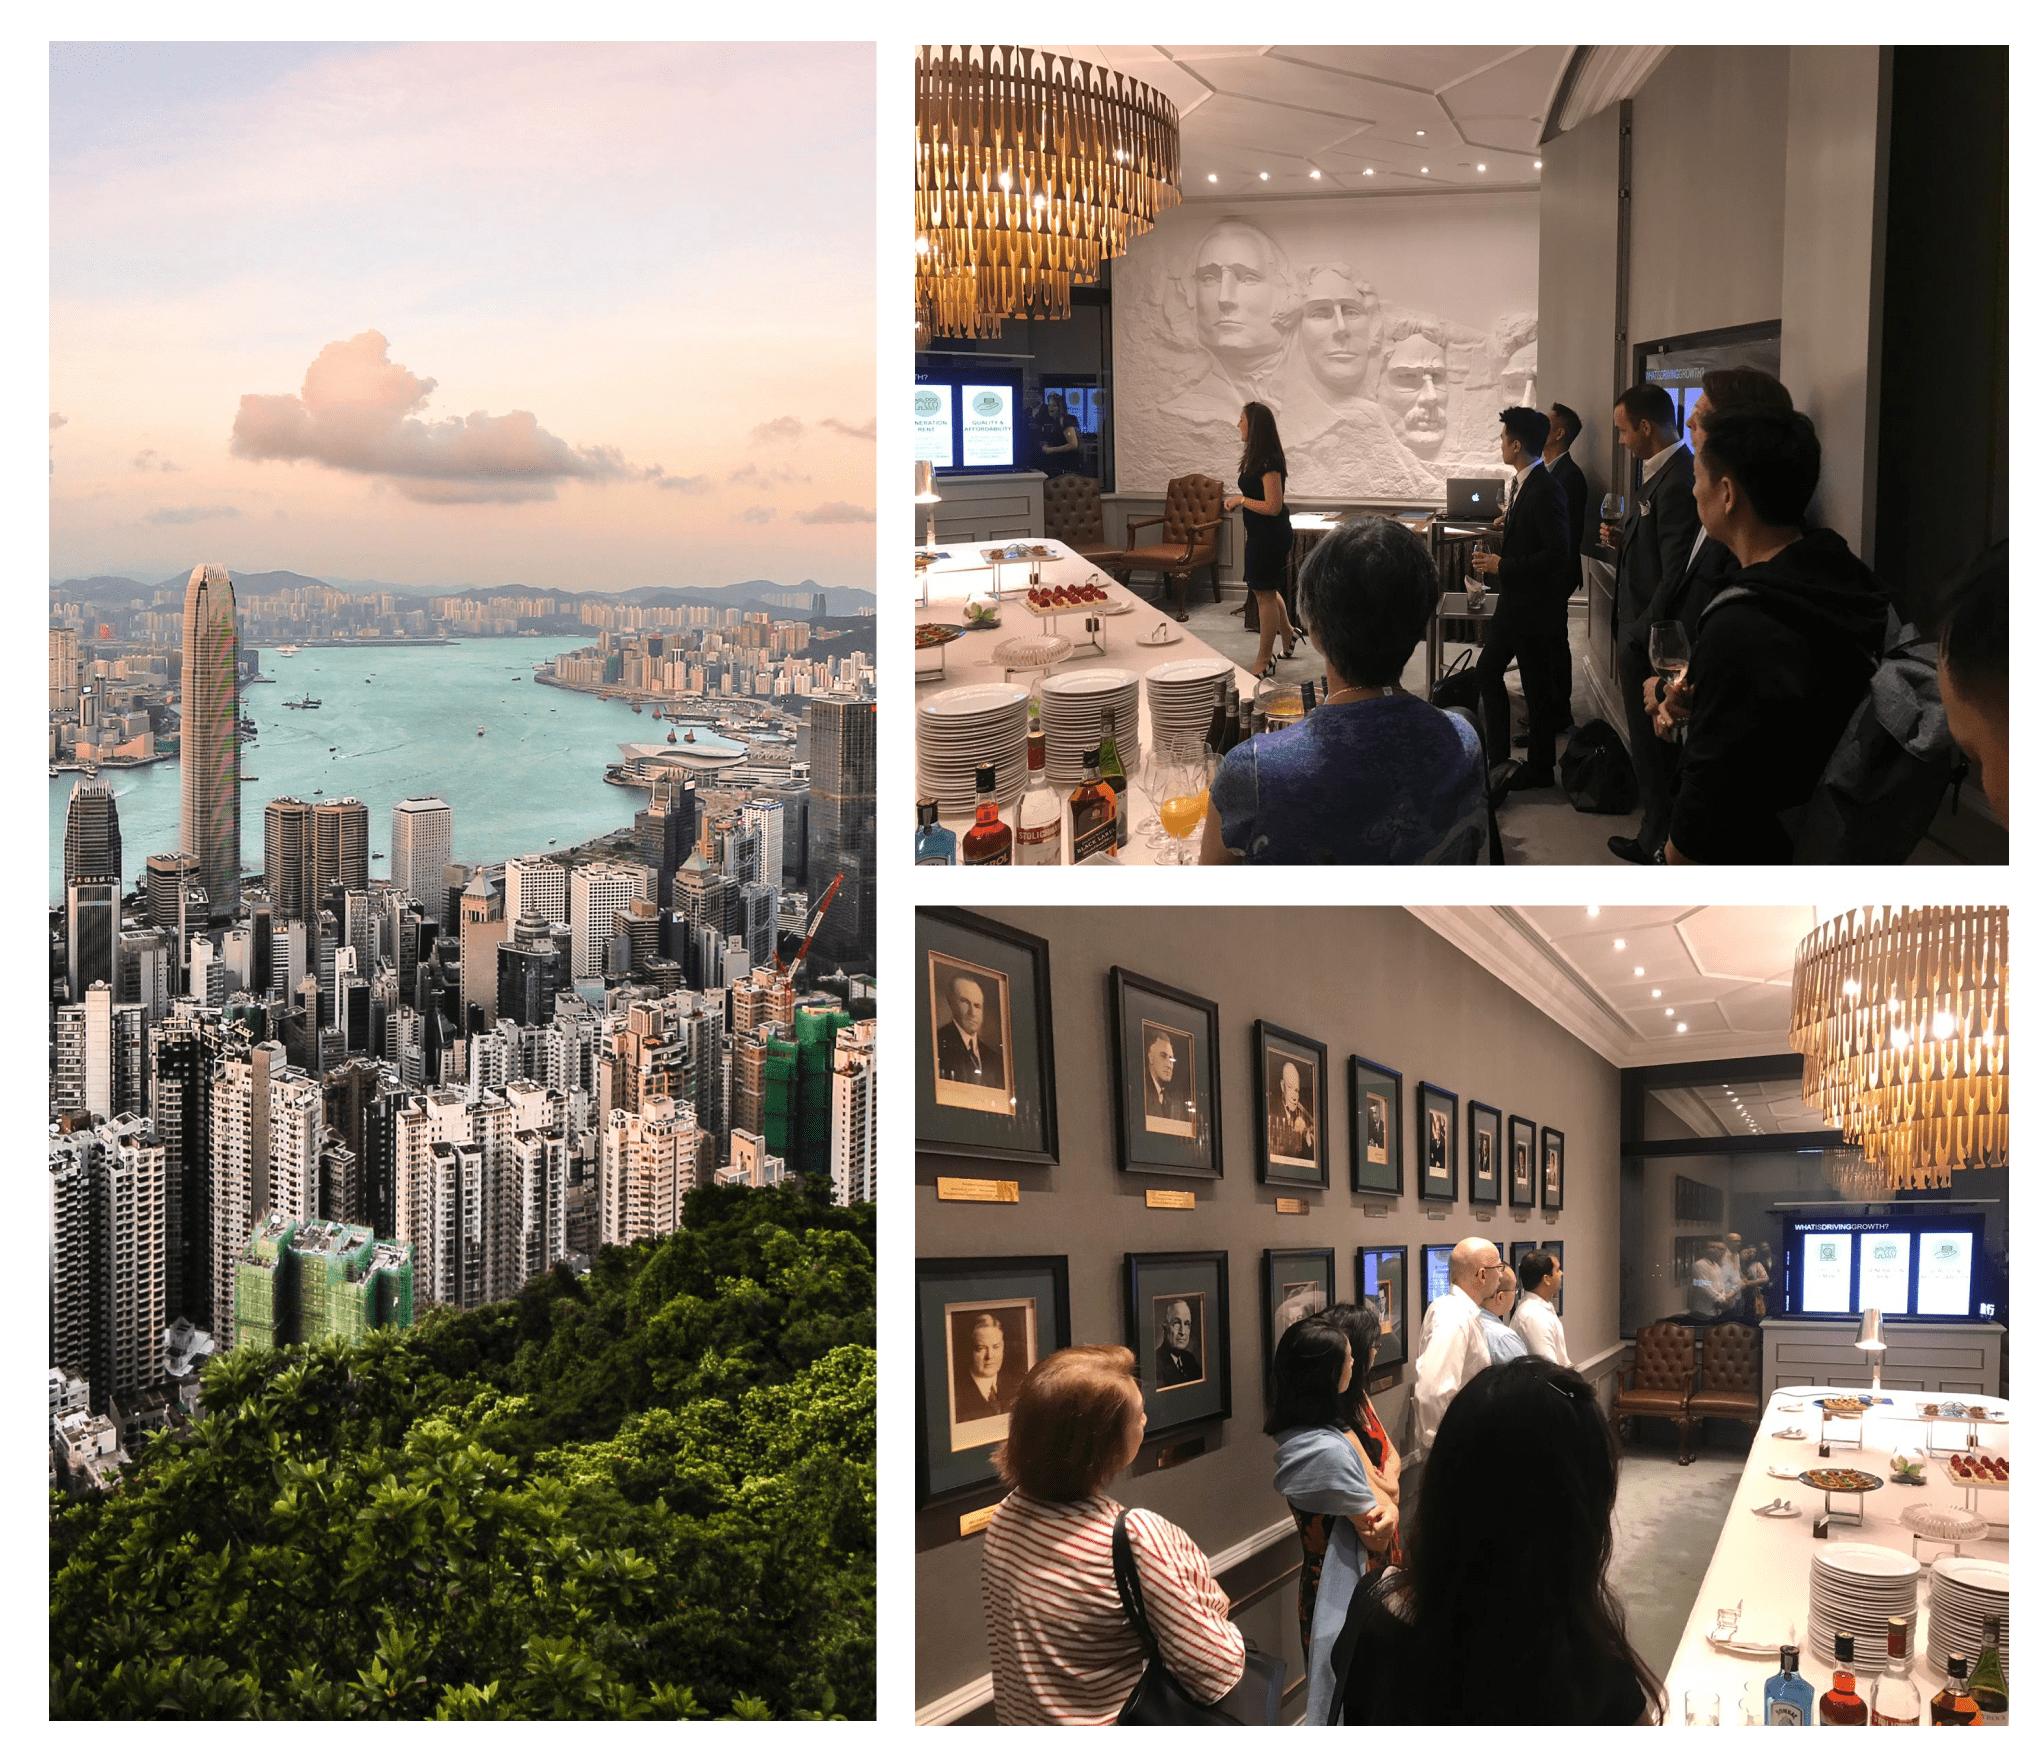 Hong Kong Event Images